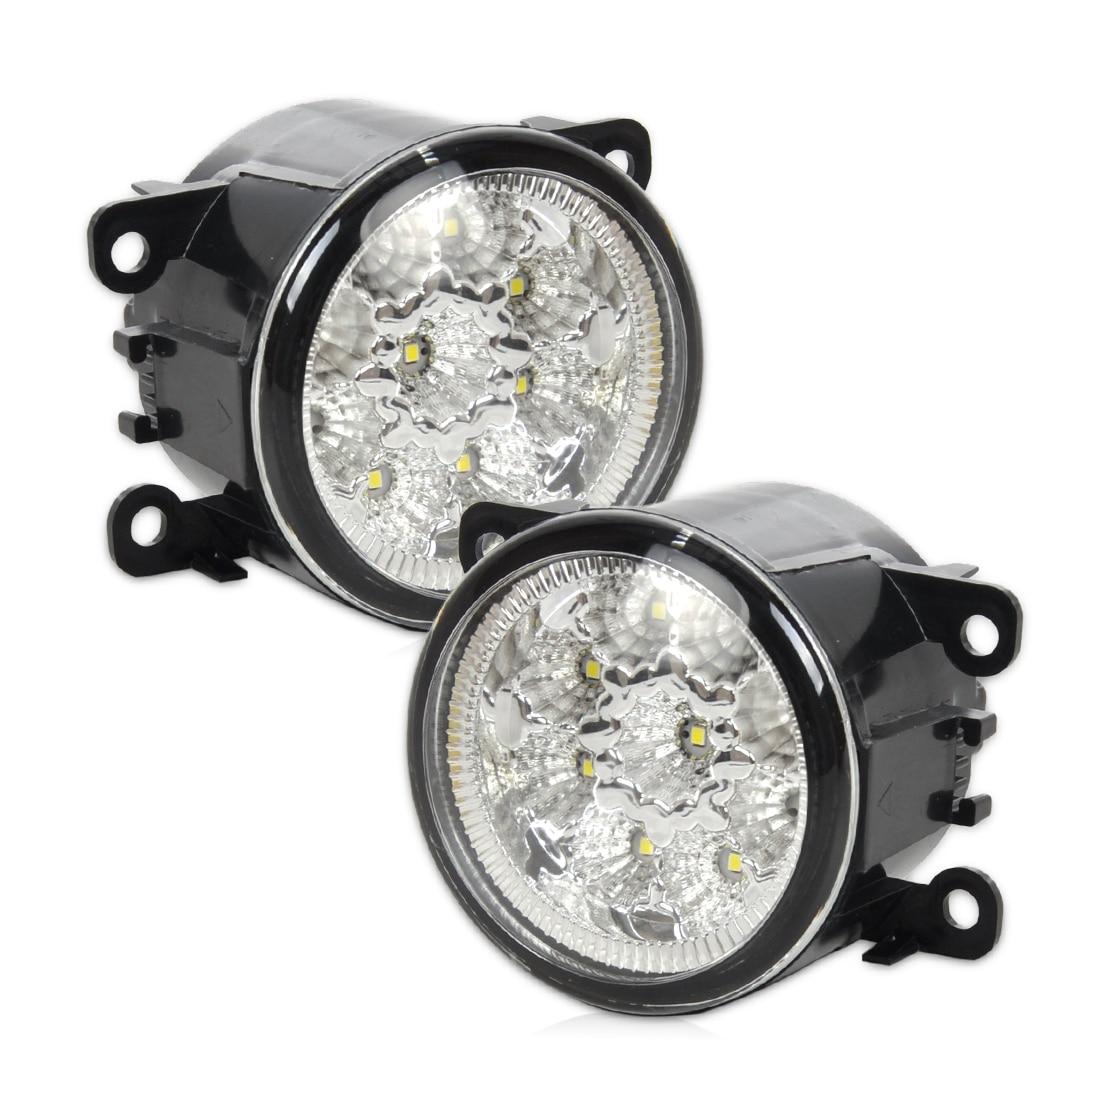 beler 2Pcs Right/Left Fog Lamp 55W 9-LED Round Front DRL Daytime Running Lights 4F9Z-15200-AA 33900STKA11 for Ford Acura Honda 2pcs left